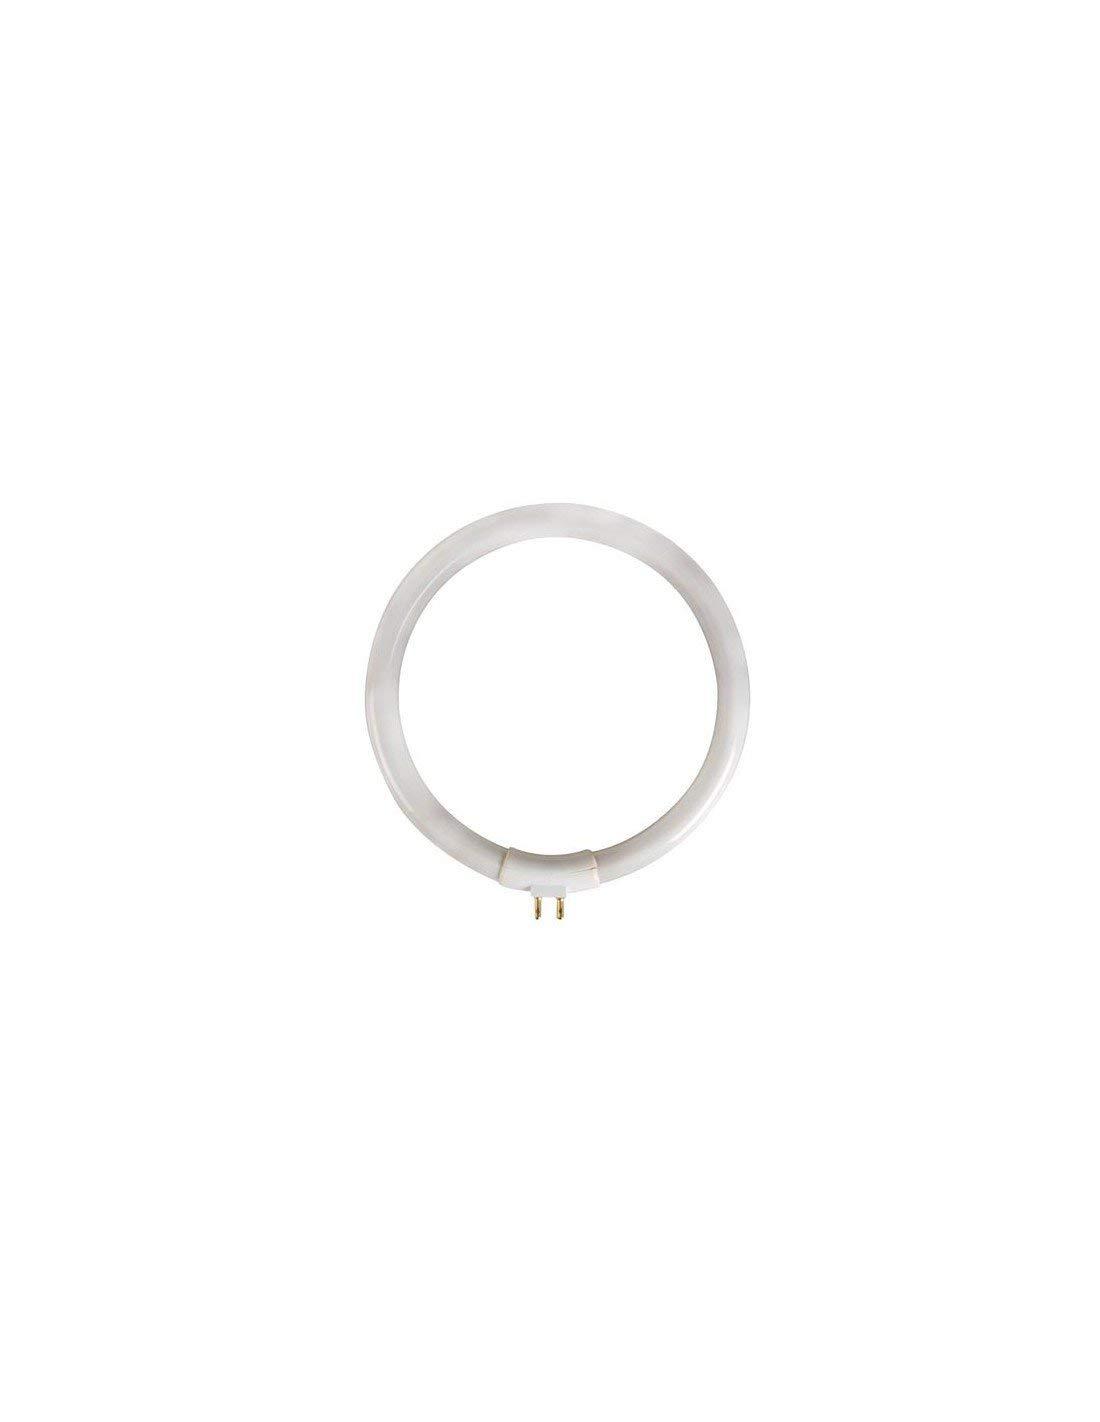 Type: T4 Fluorescent Tube Warm-White F26T4-WW 40 in Watts: 26W Color